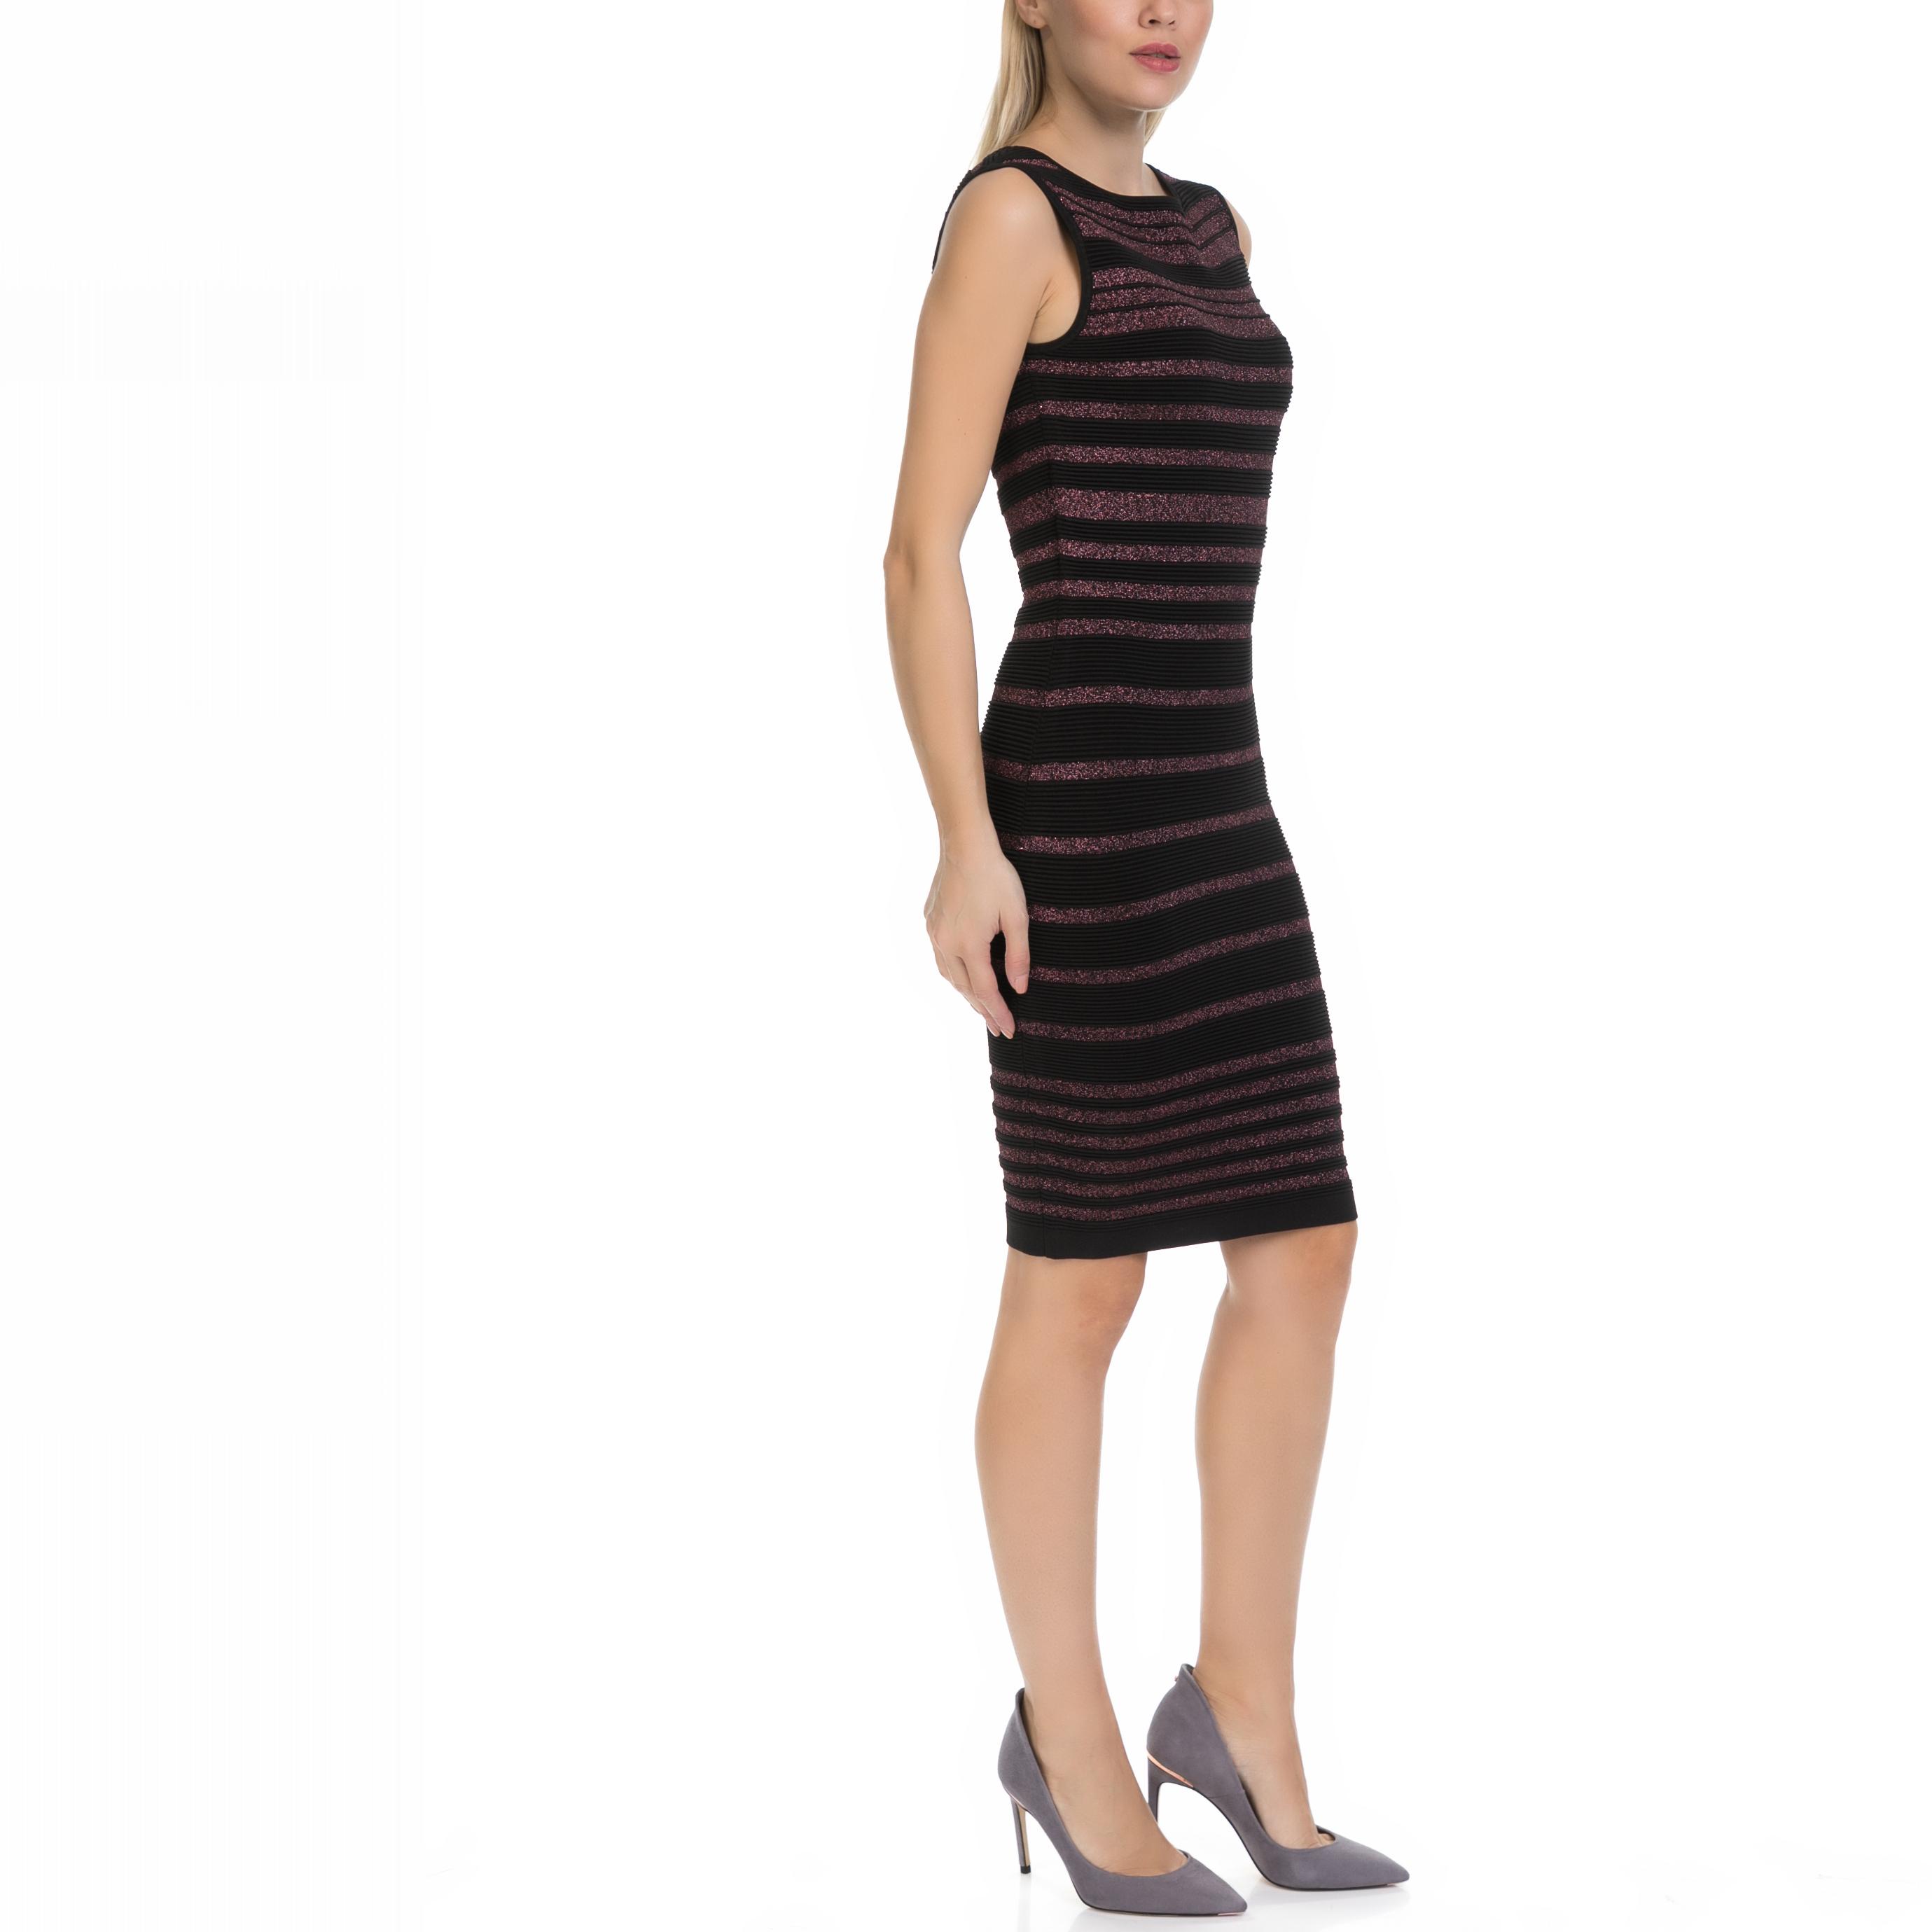 8f798448377 GUESS - Γυναικείο φόρεμα MINA GUESS μαύρο-μοβ, ΓΥΝΑΙΚΑ | ΡΟΥΧΑ | ΦΟΡΕΜΑΤΑ |  ΜΕΧΡΙ ΤΟ ΓΟΝΑΤΟ